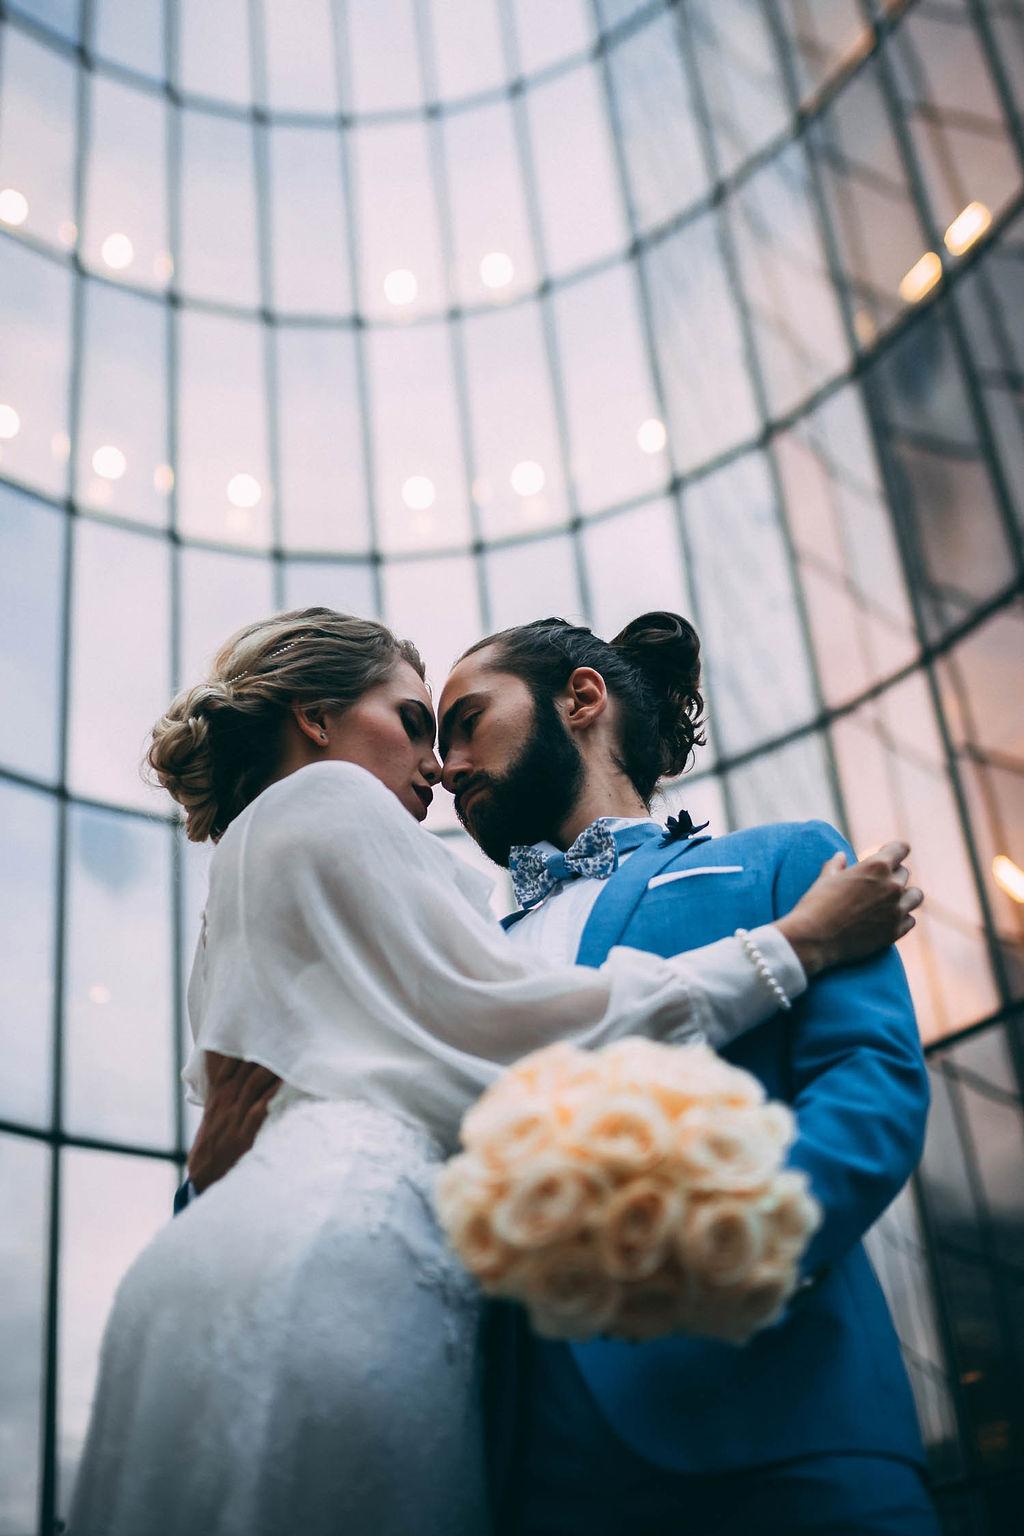 3_4_chic_urbain_couple_4_looks_sidneyonthemoon_photographe_chrisvonmartial_robe_mariee_costume_paris_wedding_web.jpg